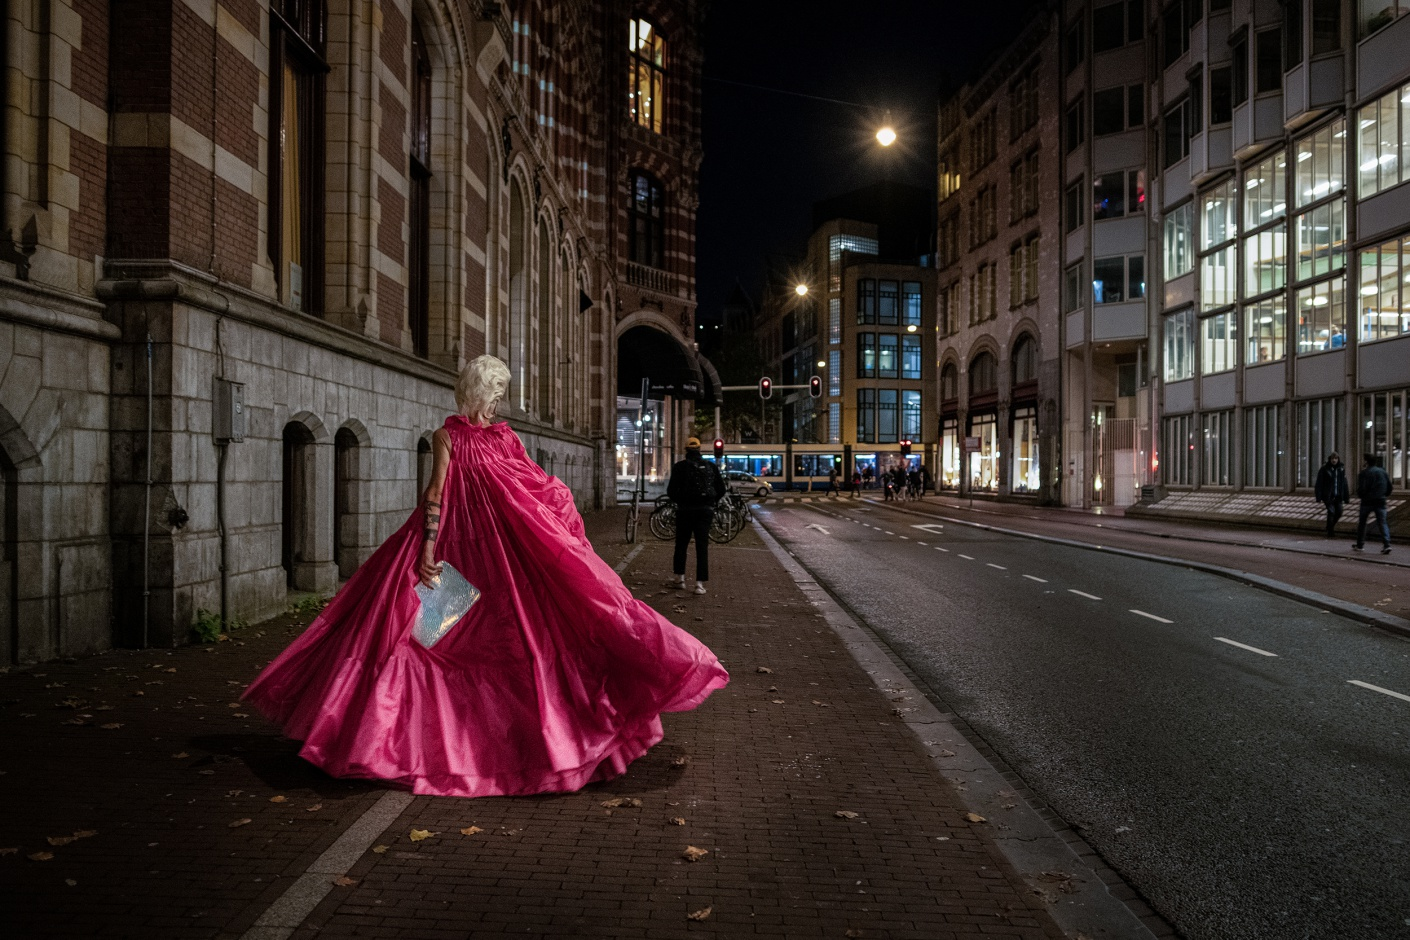 LADY GALORE | Jelle Pieter de Boer